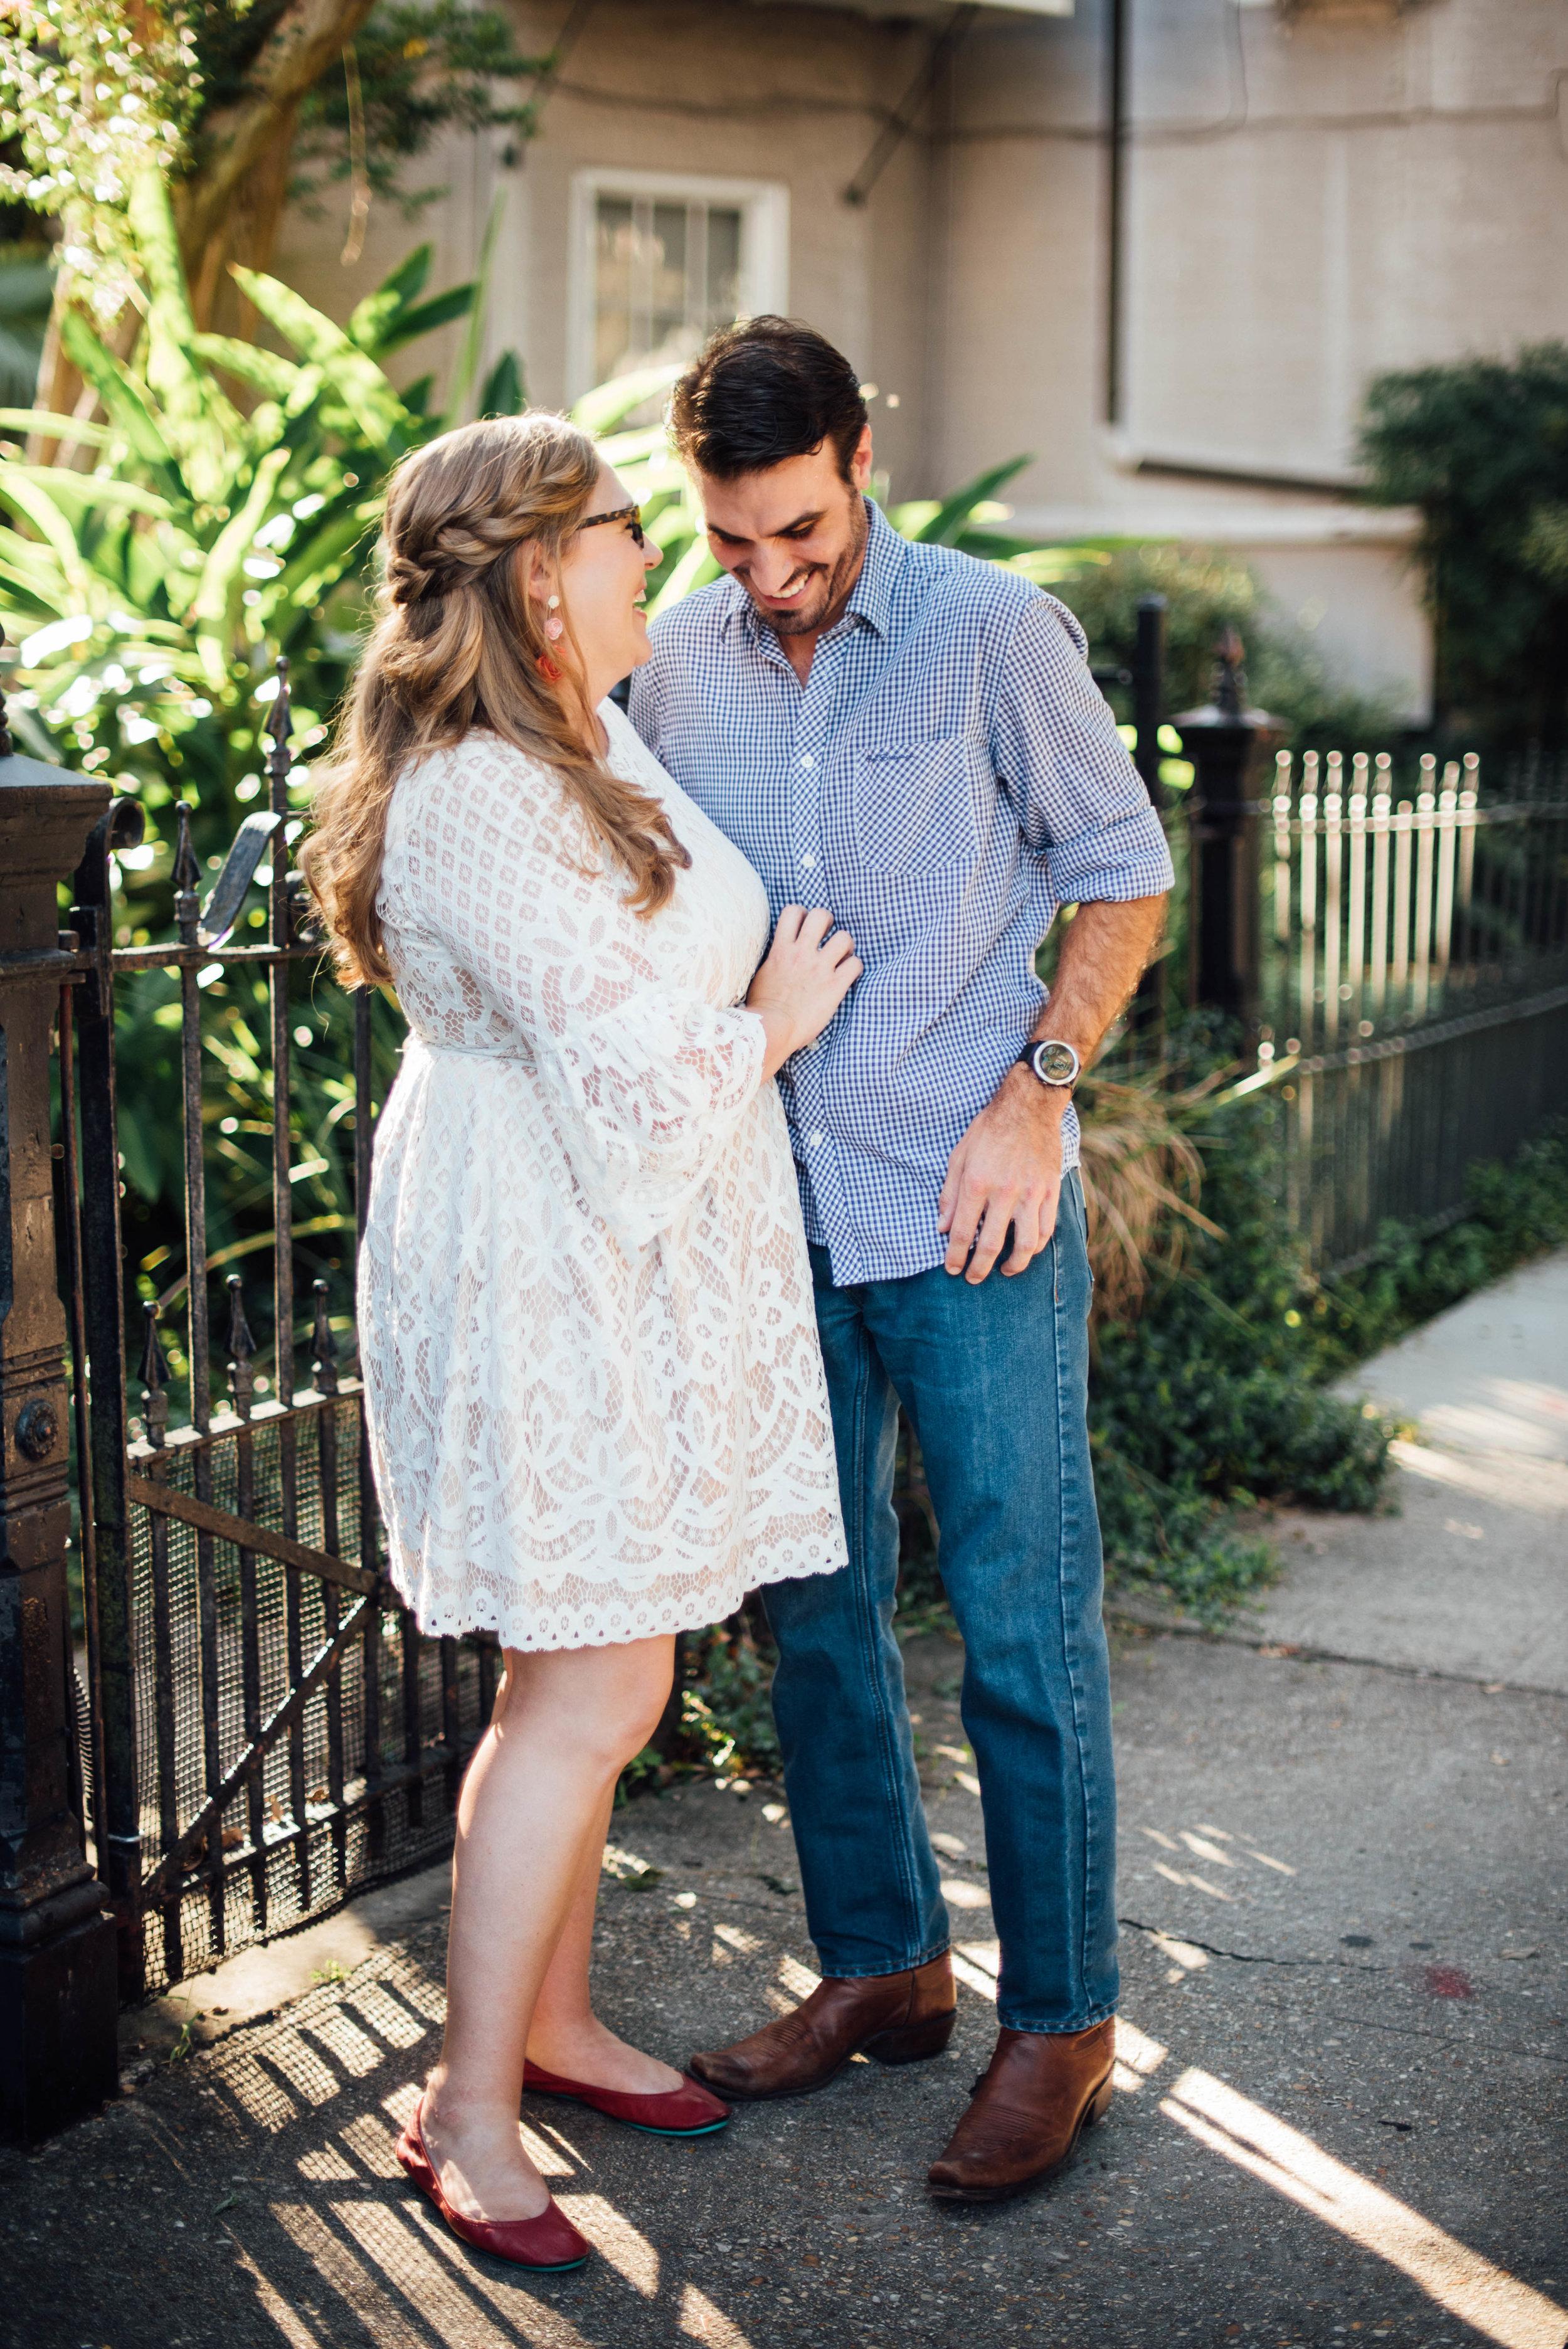 Jordan + Kent_French-Quarter-New-Orleans-City-Park-Engagement-Photos_Gabby Chapin_Print_0004.jpg